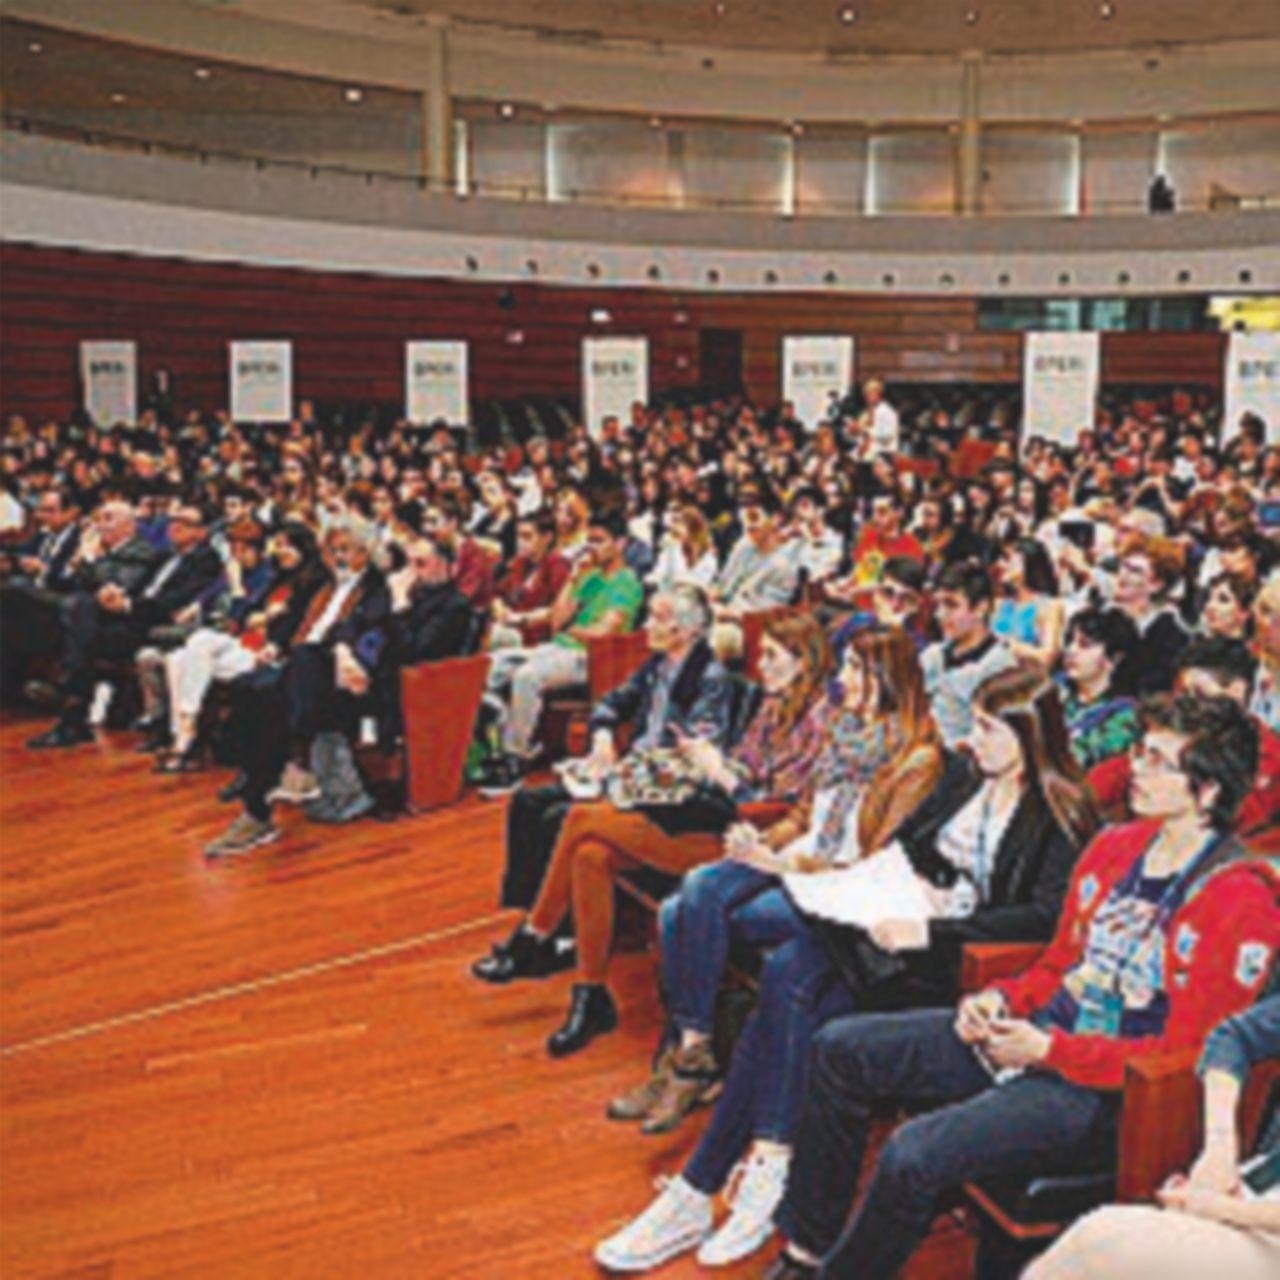 2015, Lagioia al Ninfeo, 2016, la noia all'Auditorium